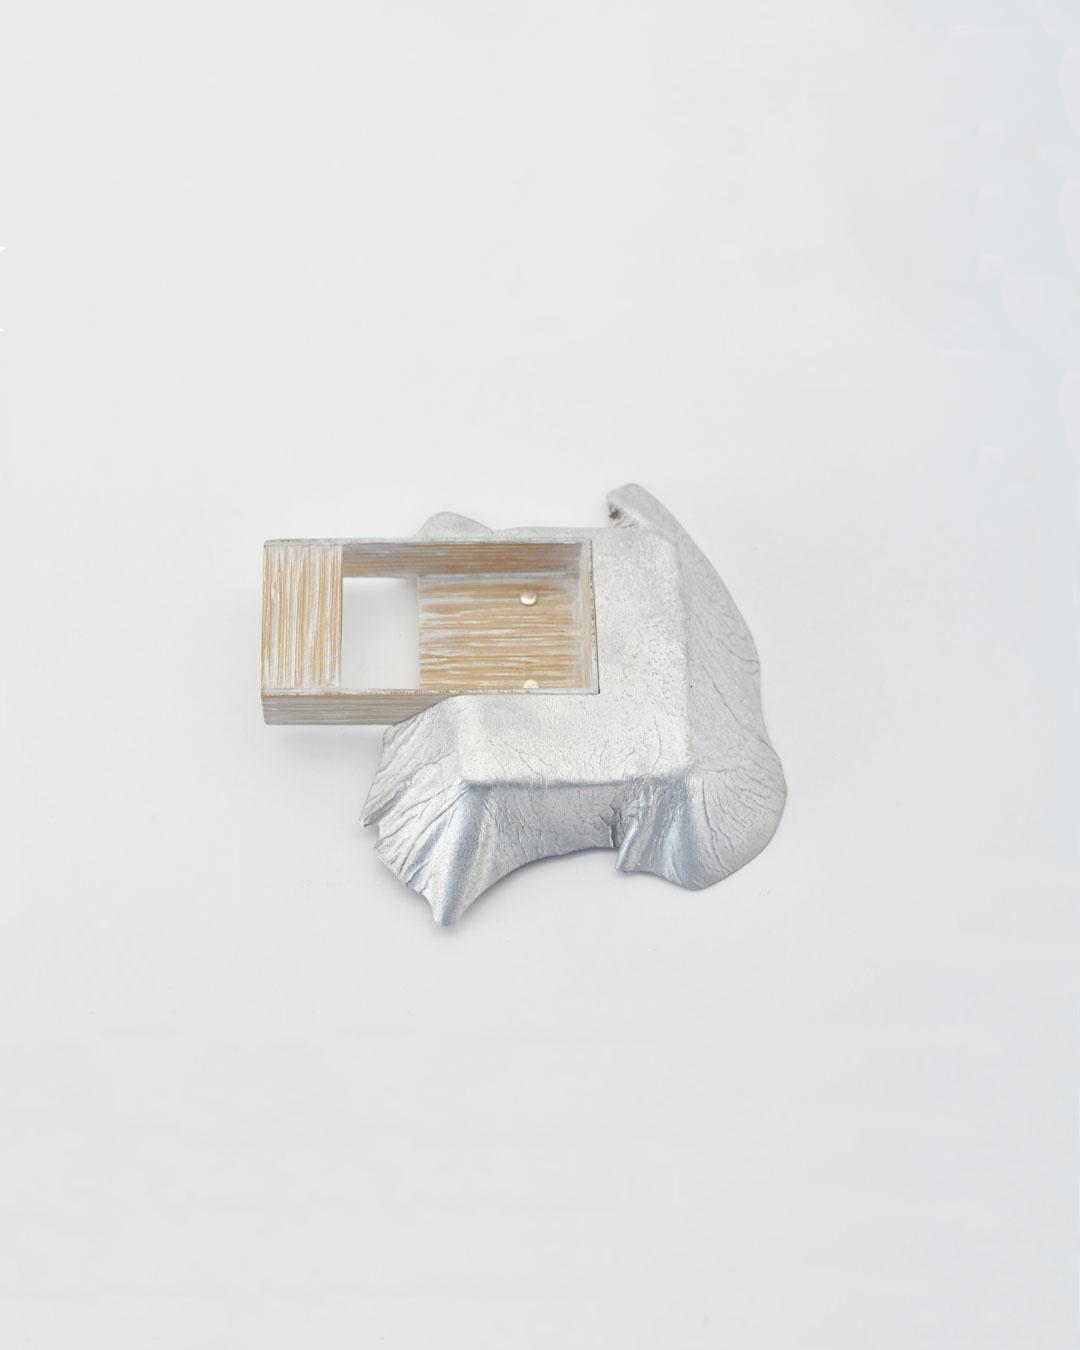 Anders Ljungberg, Declaration #2, 2019, brooch; aluminium, laminated oak, steel, 128 x 120 x 25 mm, €920